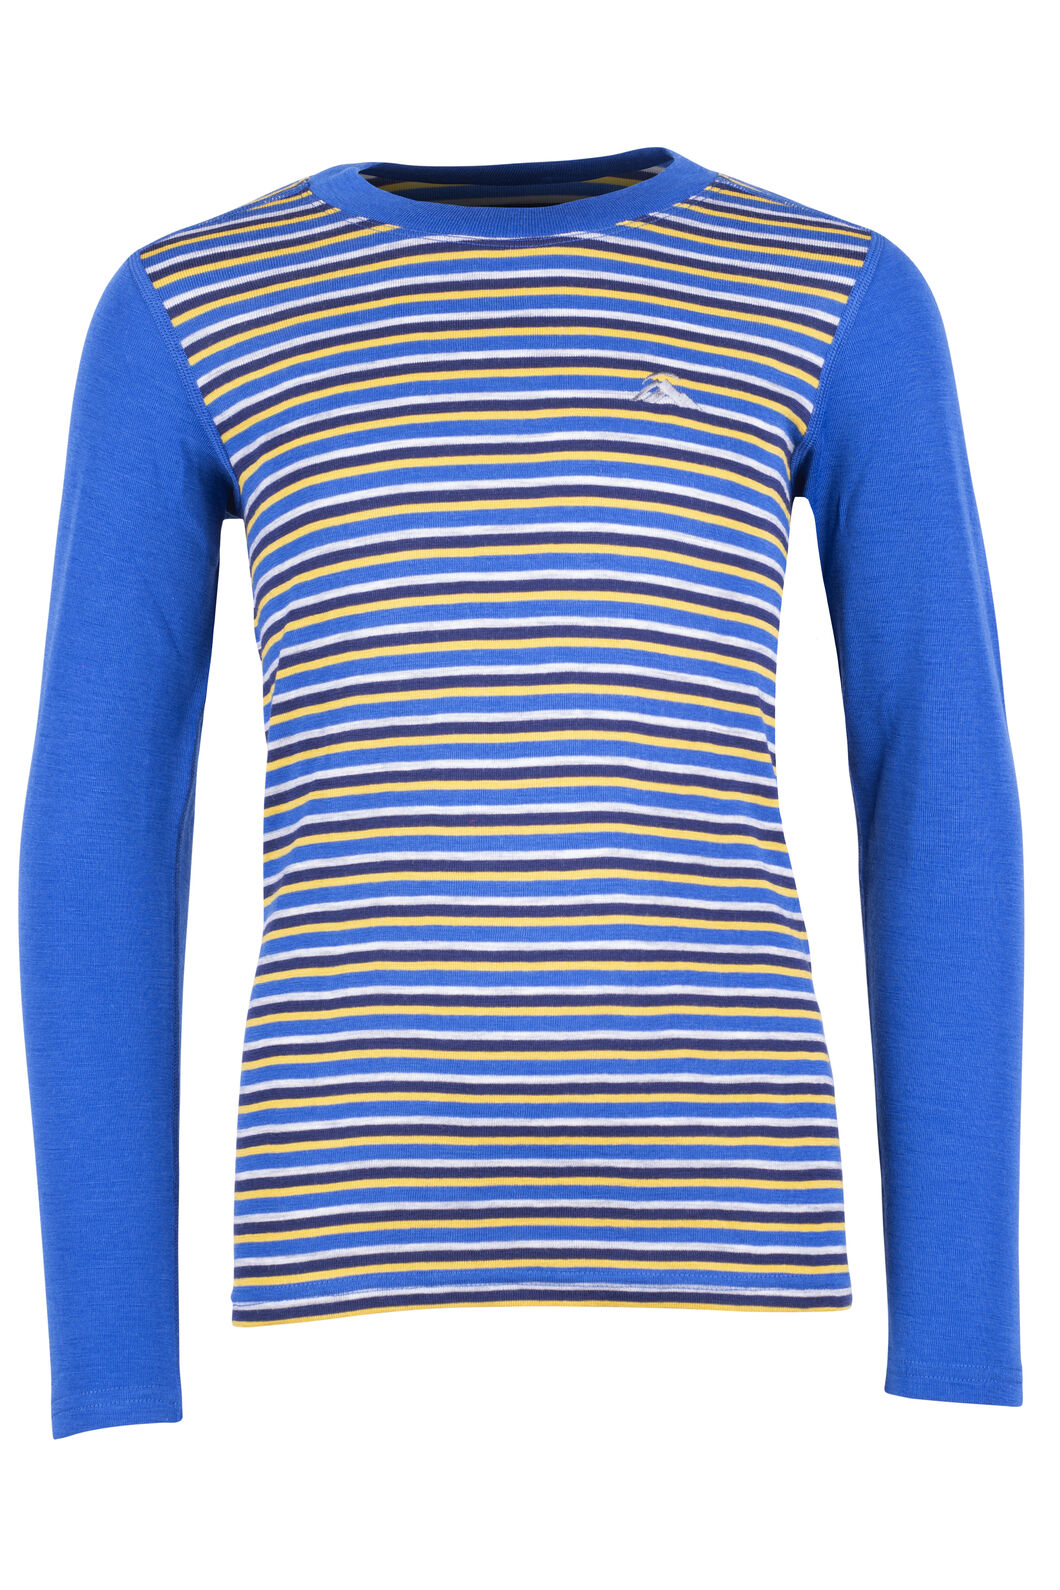 220 Merino Long Sleeve Top - Kids', Olympian Stripe, hi-res